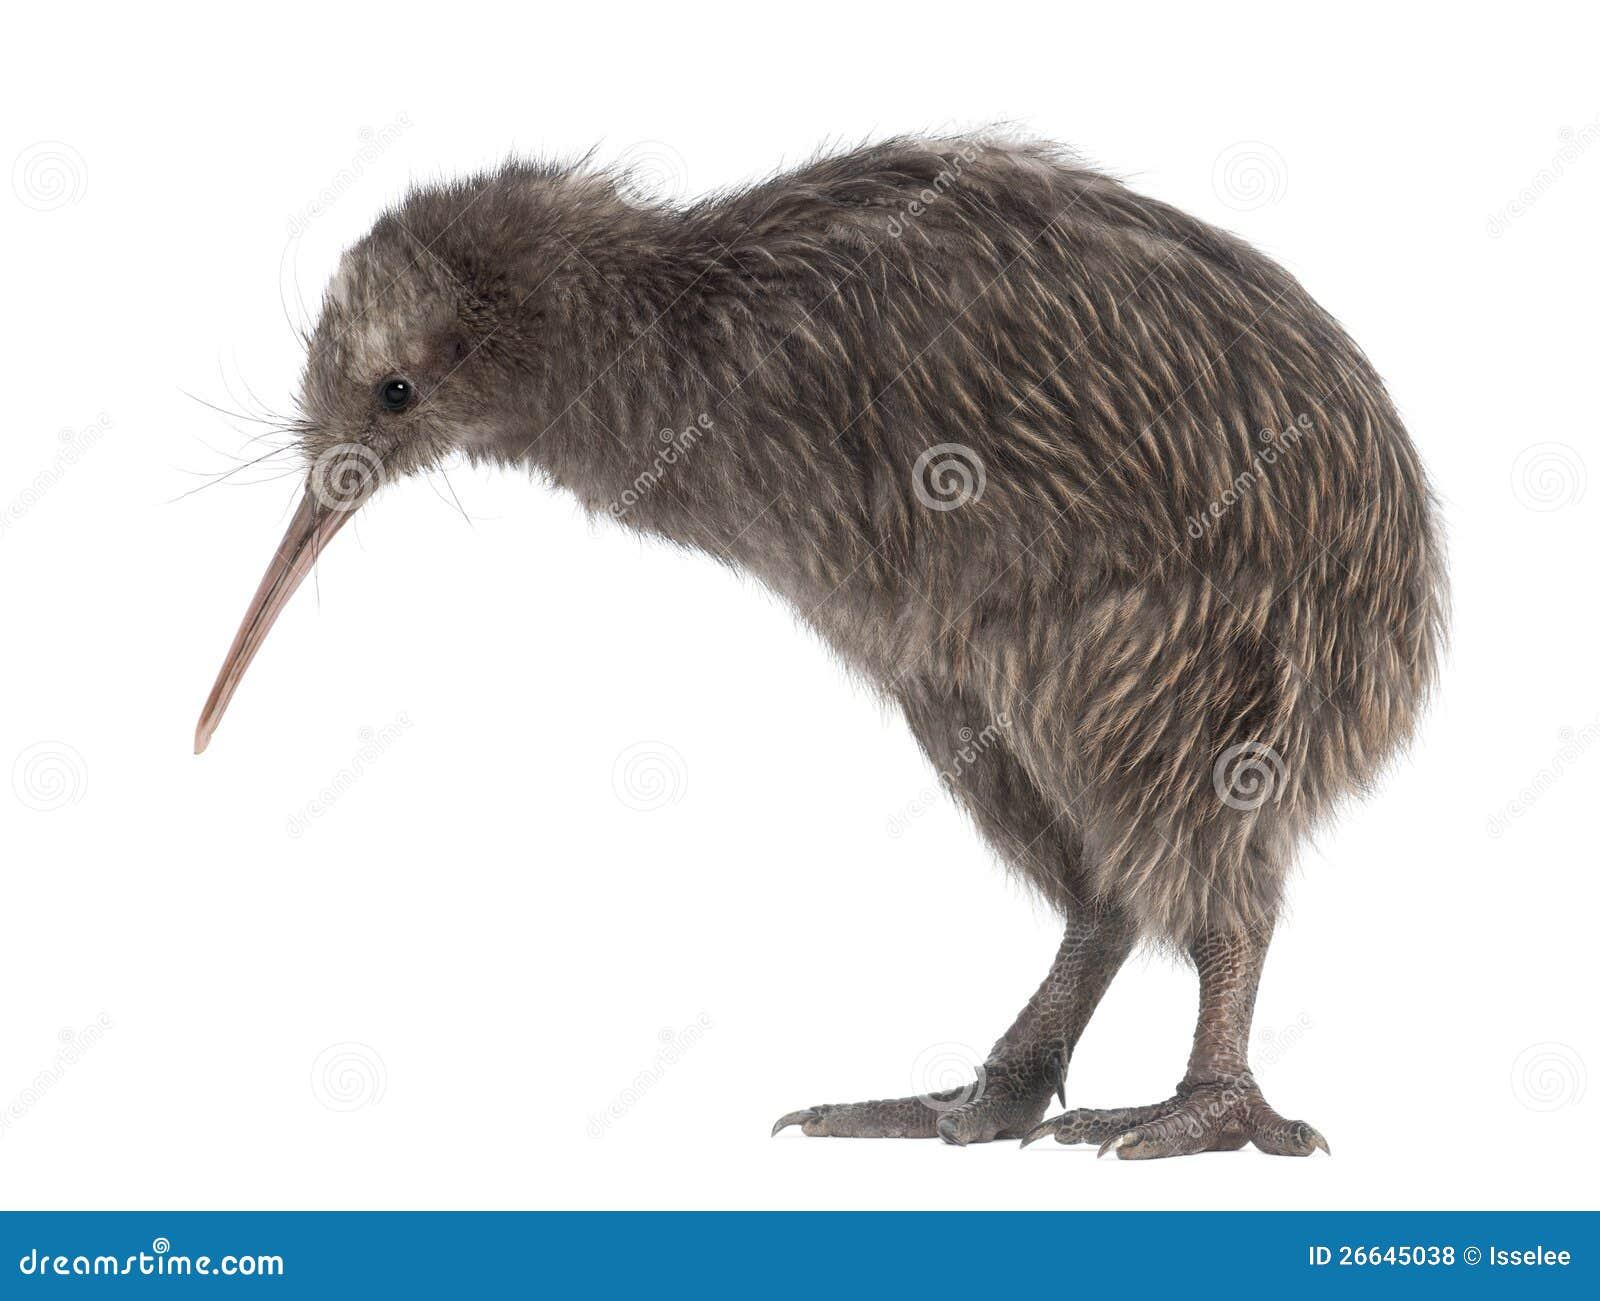 North Island Brown Kiwi, Apteryx mantelli